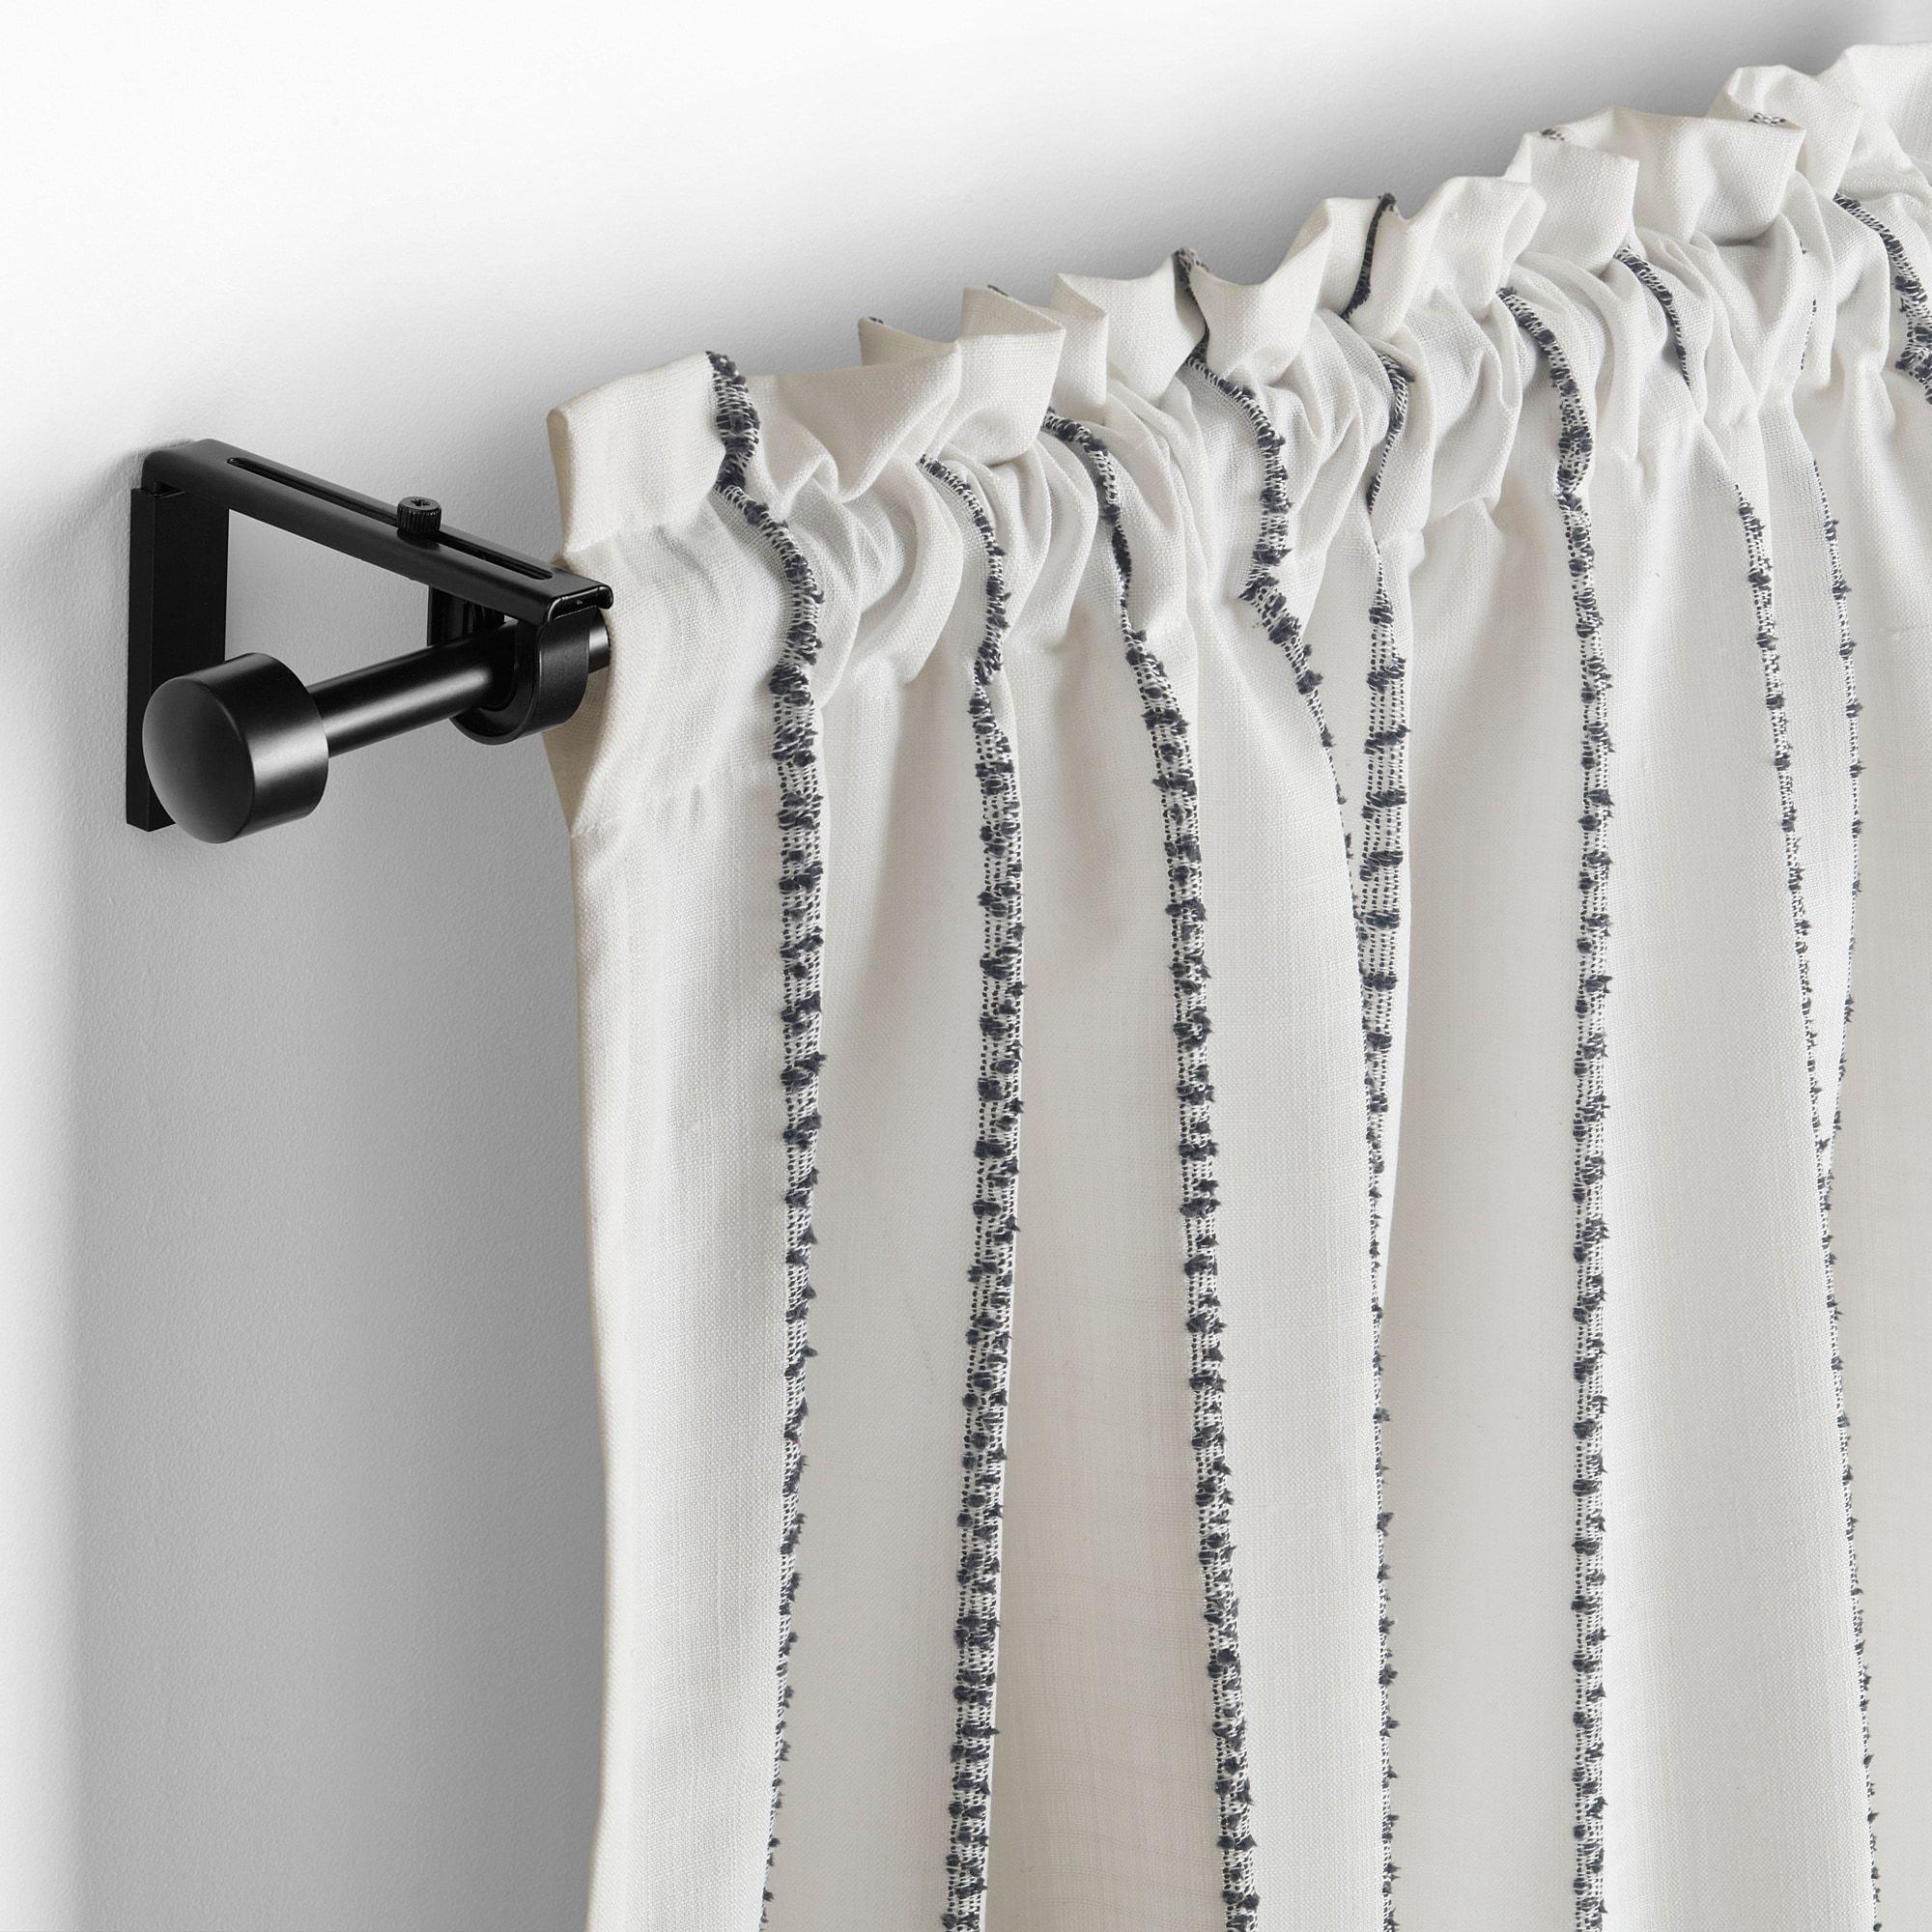 Ikea Vilmie Linje White Dark Gray Curtains 1 Pair In 2020